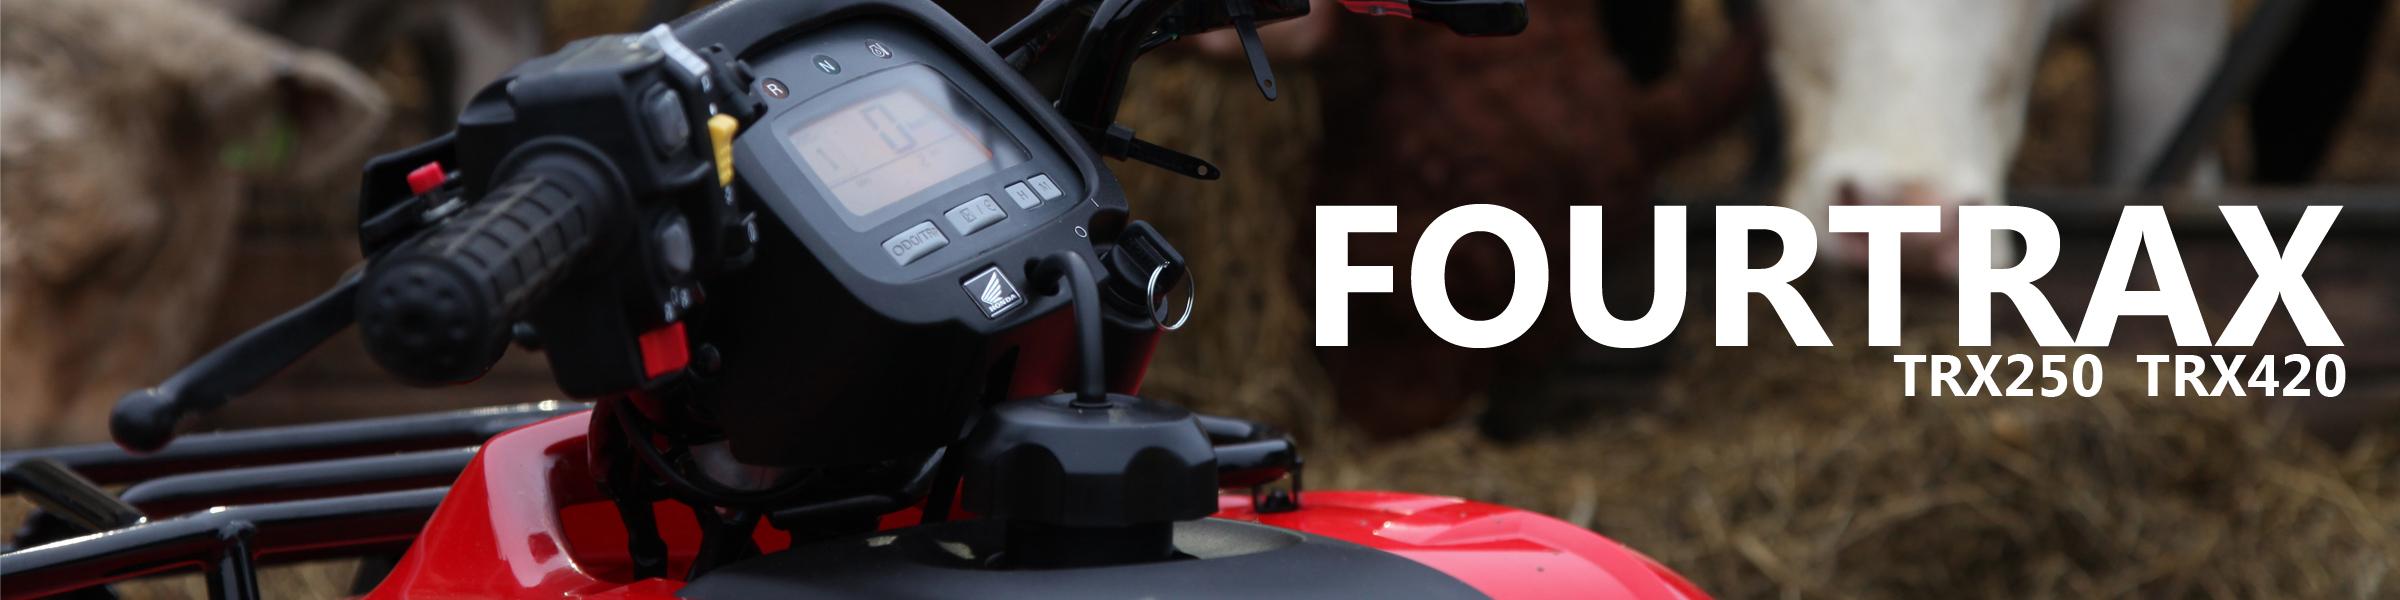 Honda Fourtrax trx 250 trx 420 Sales service Yorkshire Lincolnshire Rican ATV